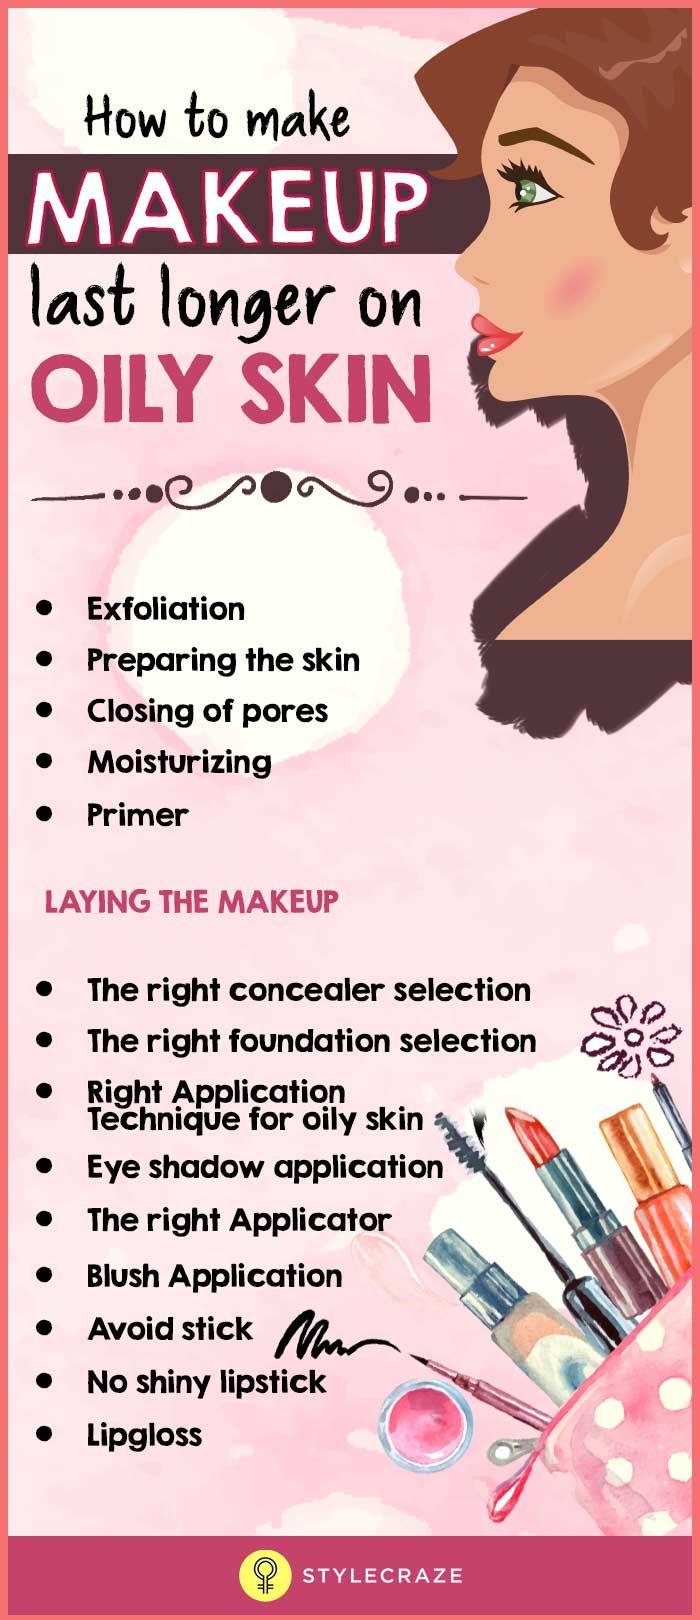 How to make Makeup last longer on Oily skin?  Treating oily skin